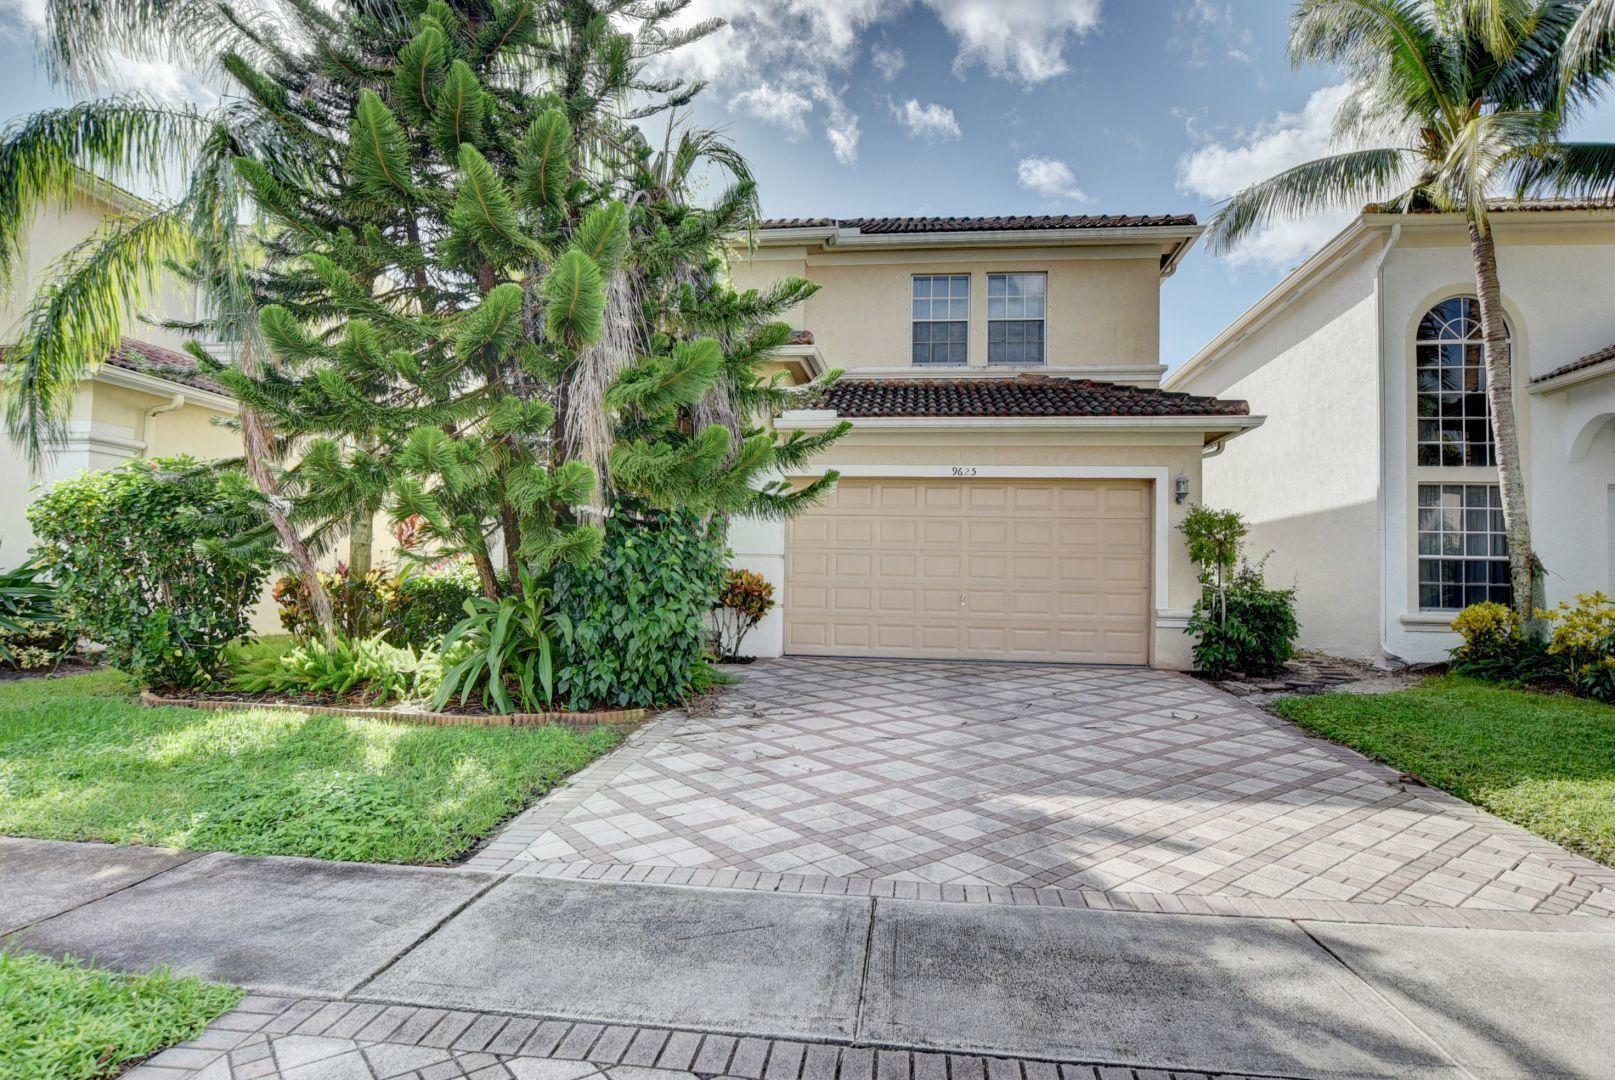 9625 Vineyard Court, Boca Raton, FL 33428 - MLS#: RX-10718733